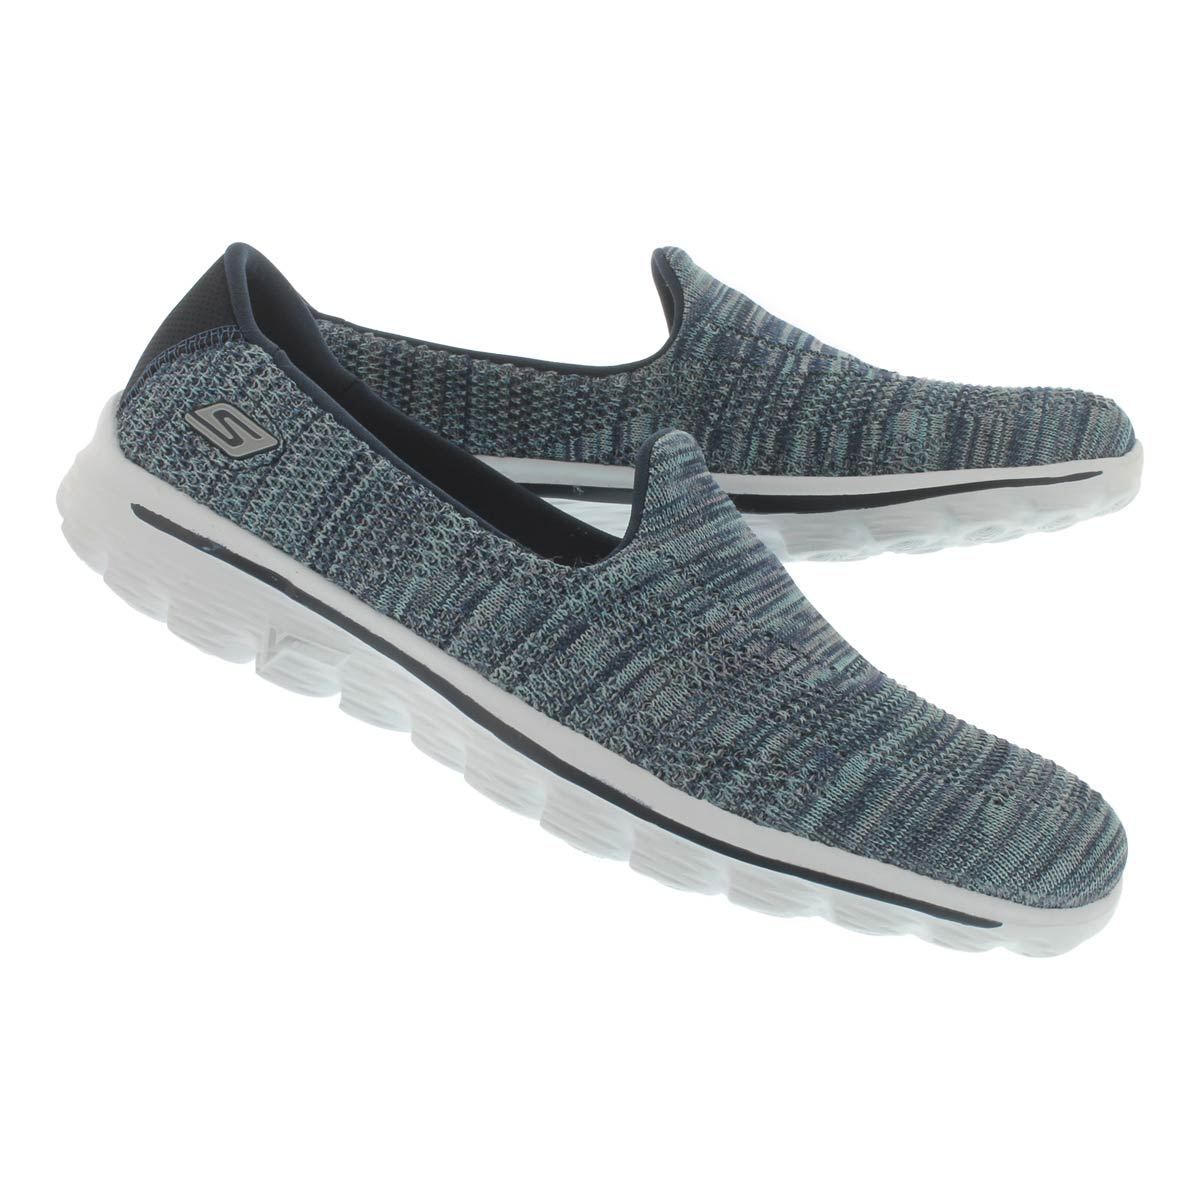 Lds GOwalk 2 Hypo navy slip on shoe